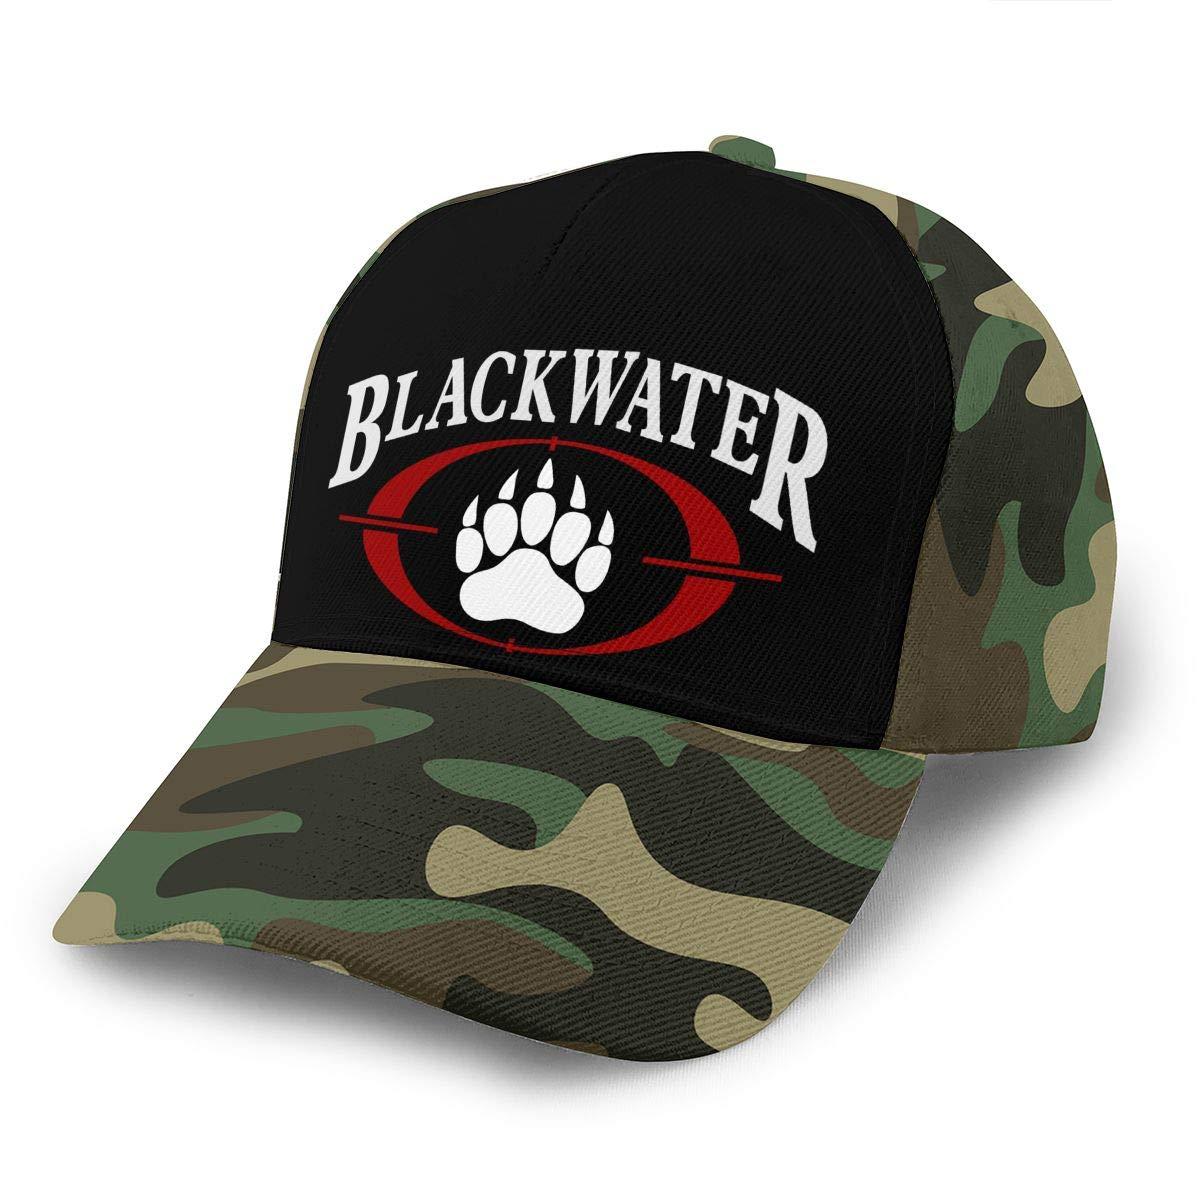 Adjustable Women Men Blackwater-Logo Print Baseball Cap Flat Brim Cap Hats Hip Hop Snapback Sun Hat Boys Girls Moss Green by Apolonia